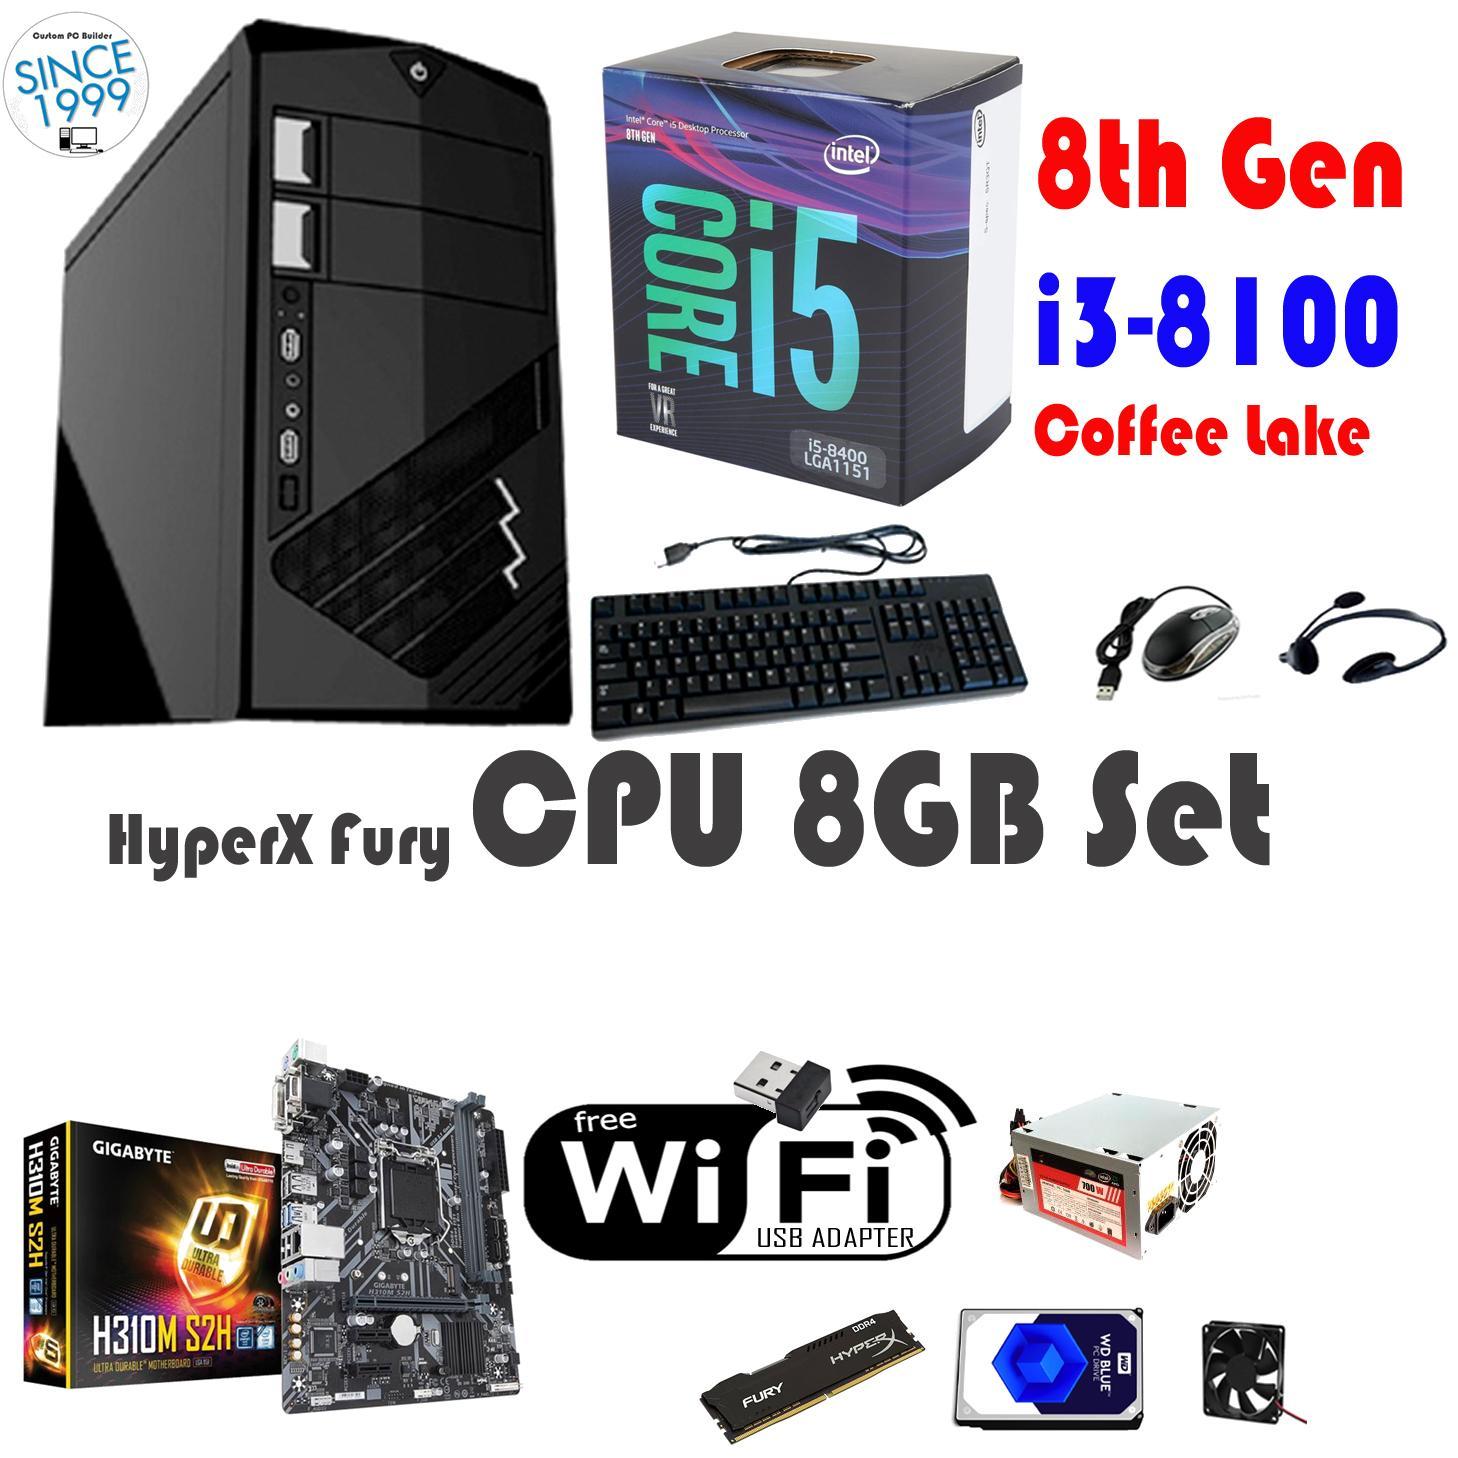 Cpu Hyperx 8gb Intel Core I3 8100 Coffee Lake Quad 36 Ghz Lga Pentium G4600 36ghz Kabylake Socket 1151 8th Gen 300 Series 65w Philippines